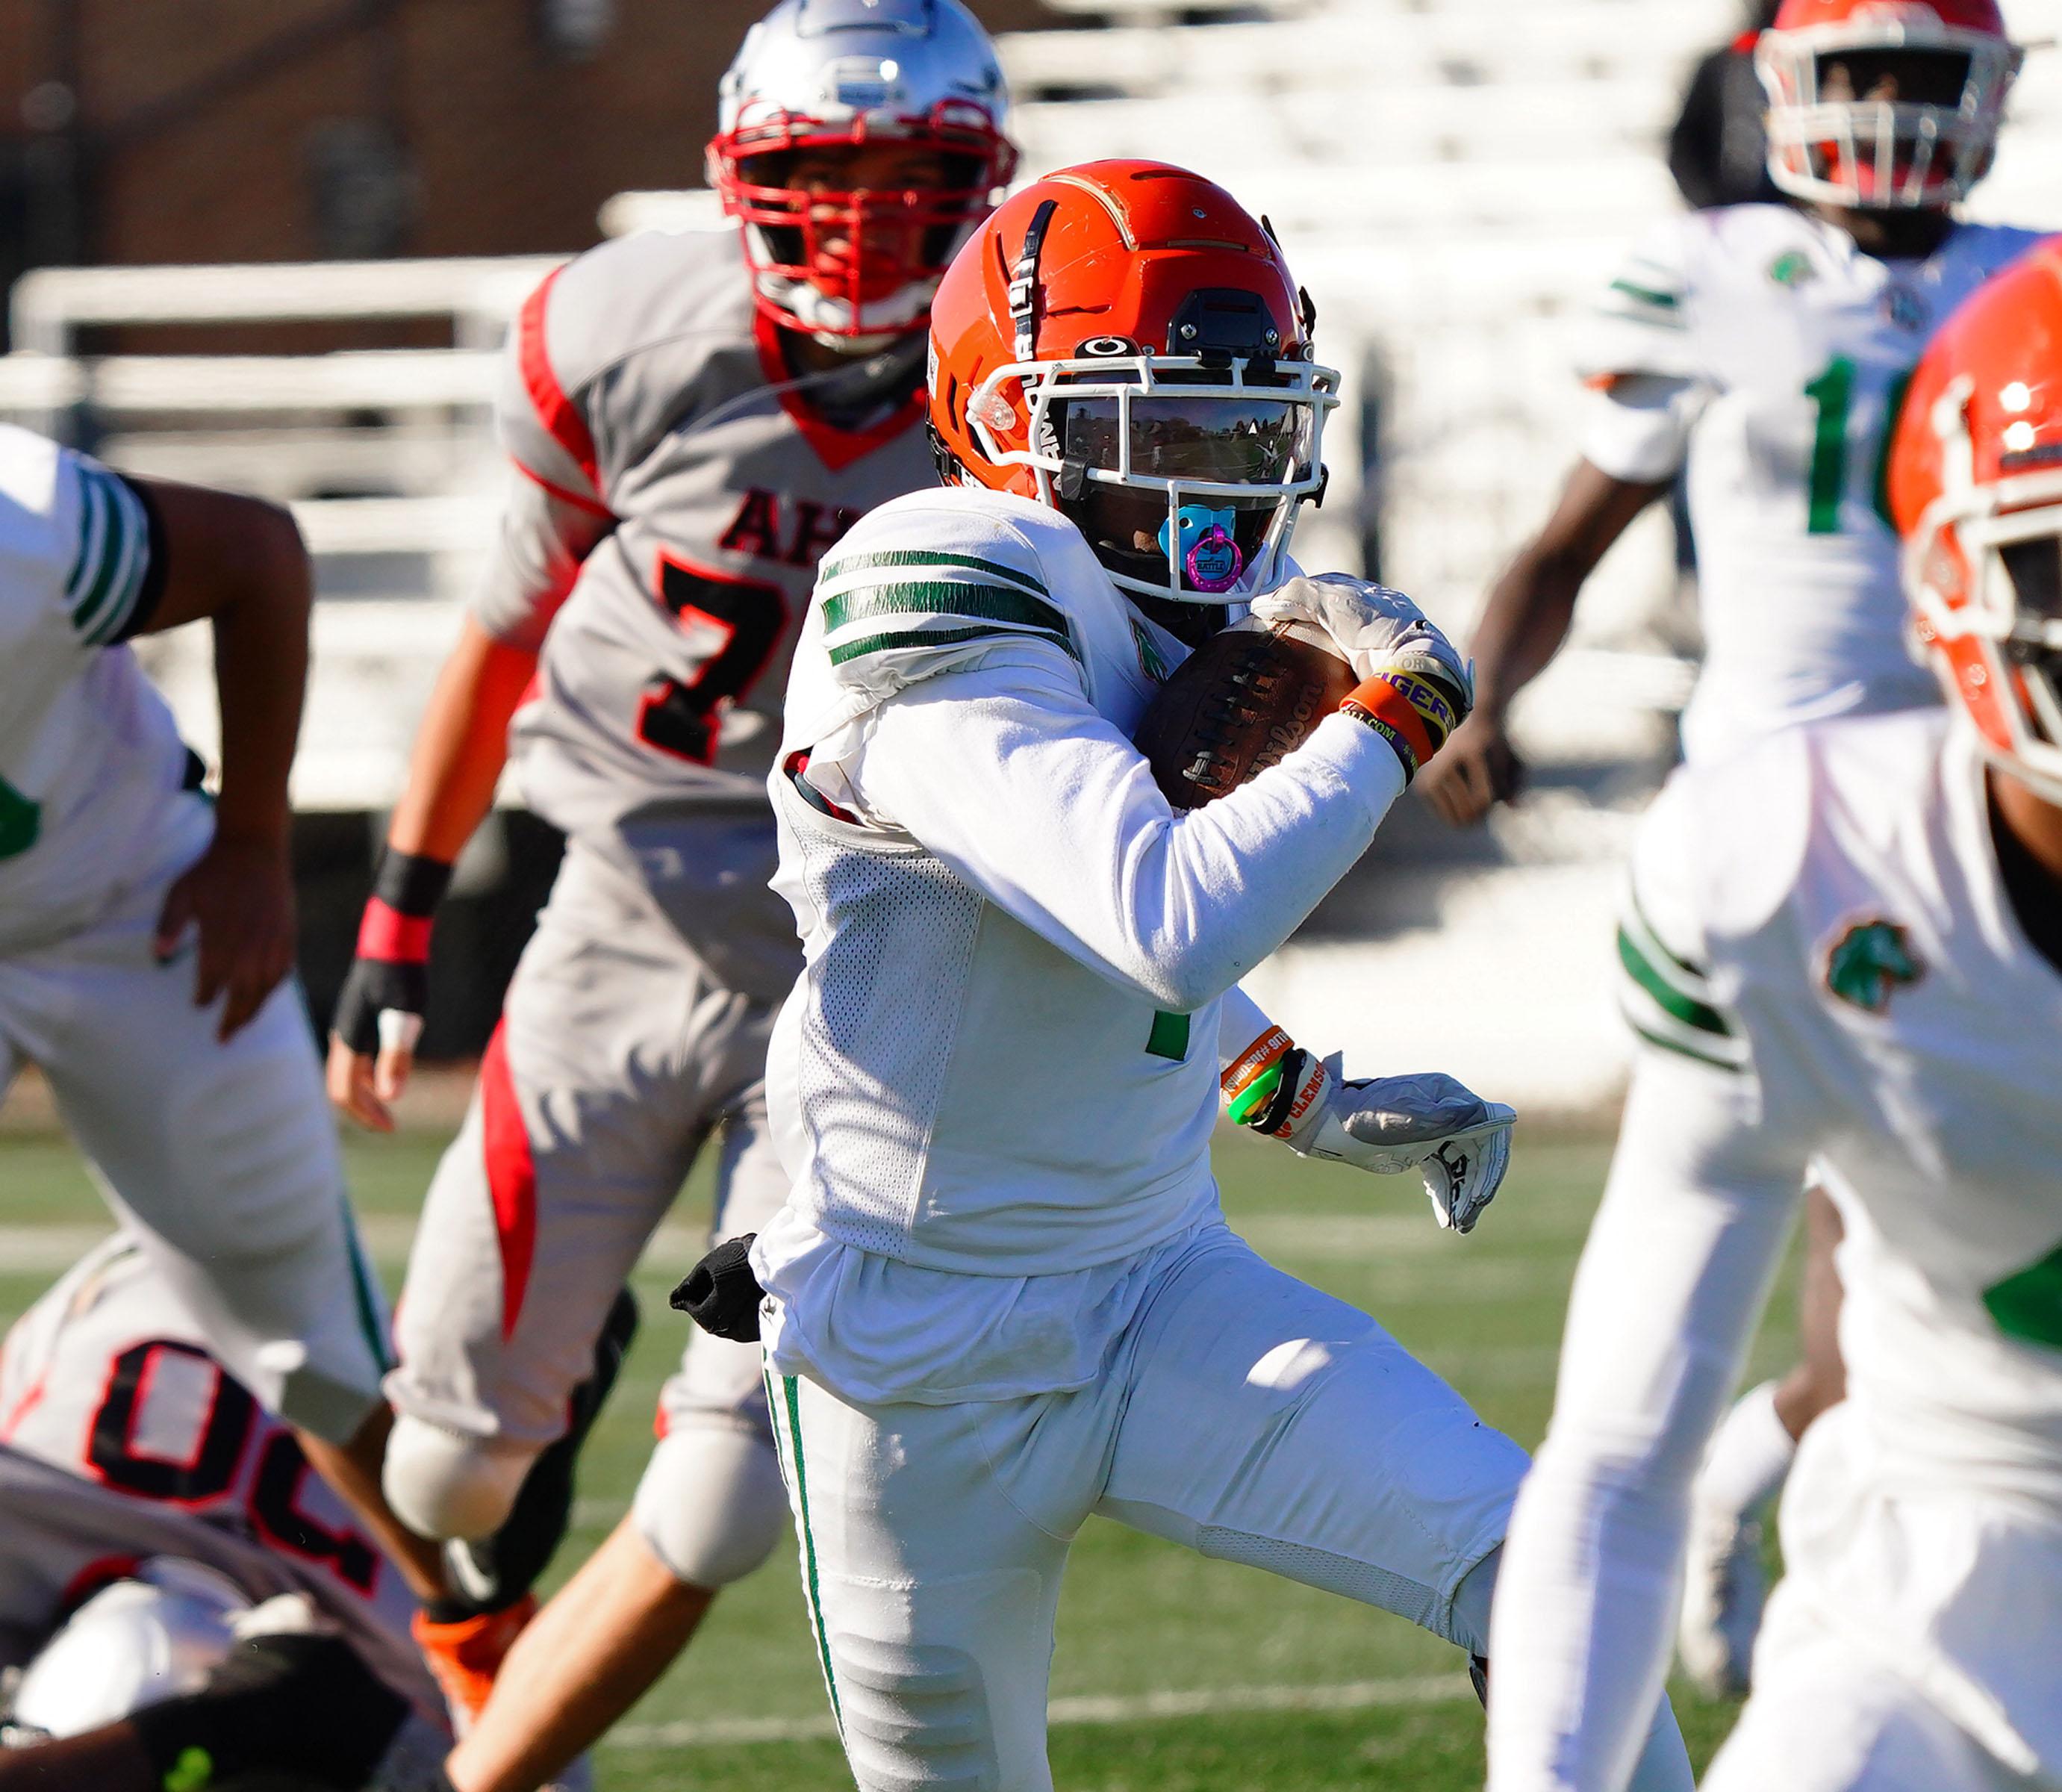 Morgan Park's Tysean Griffin (1) takes off on a 48 yard touchdown run against Amundsen.